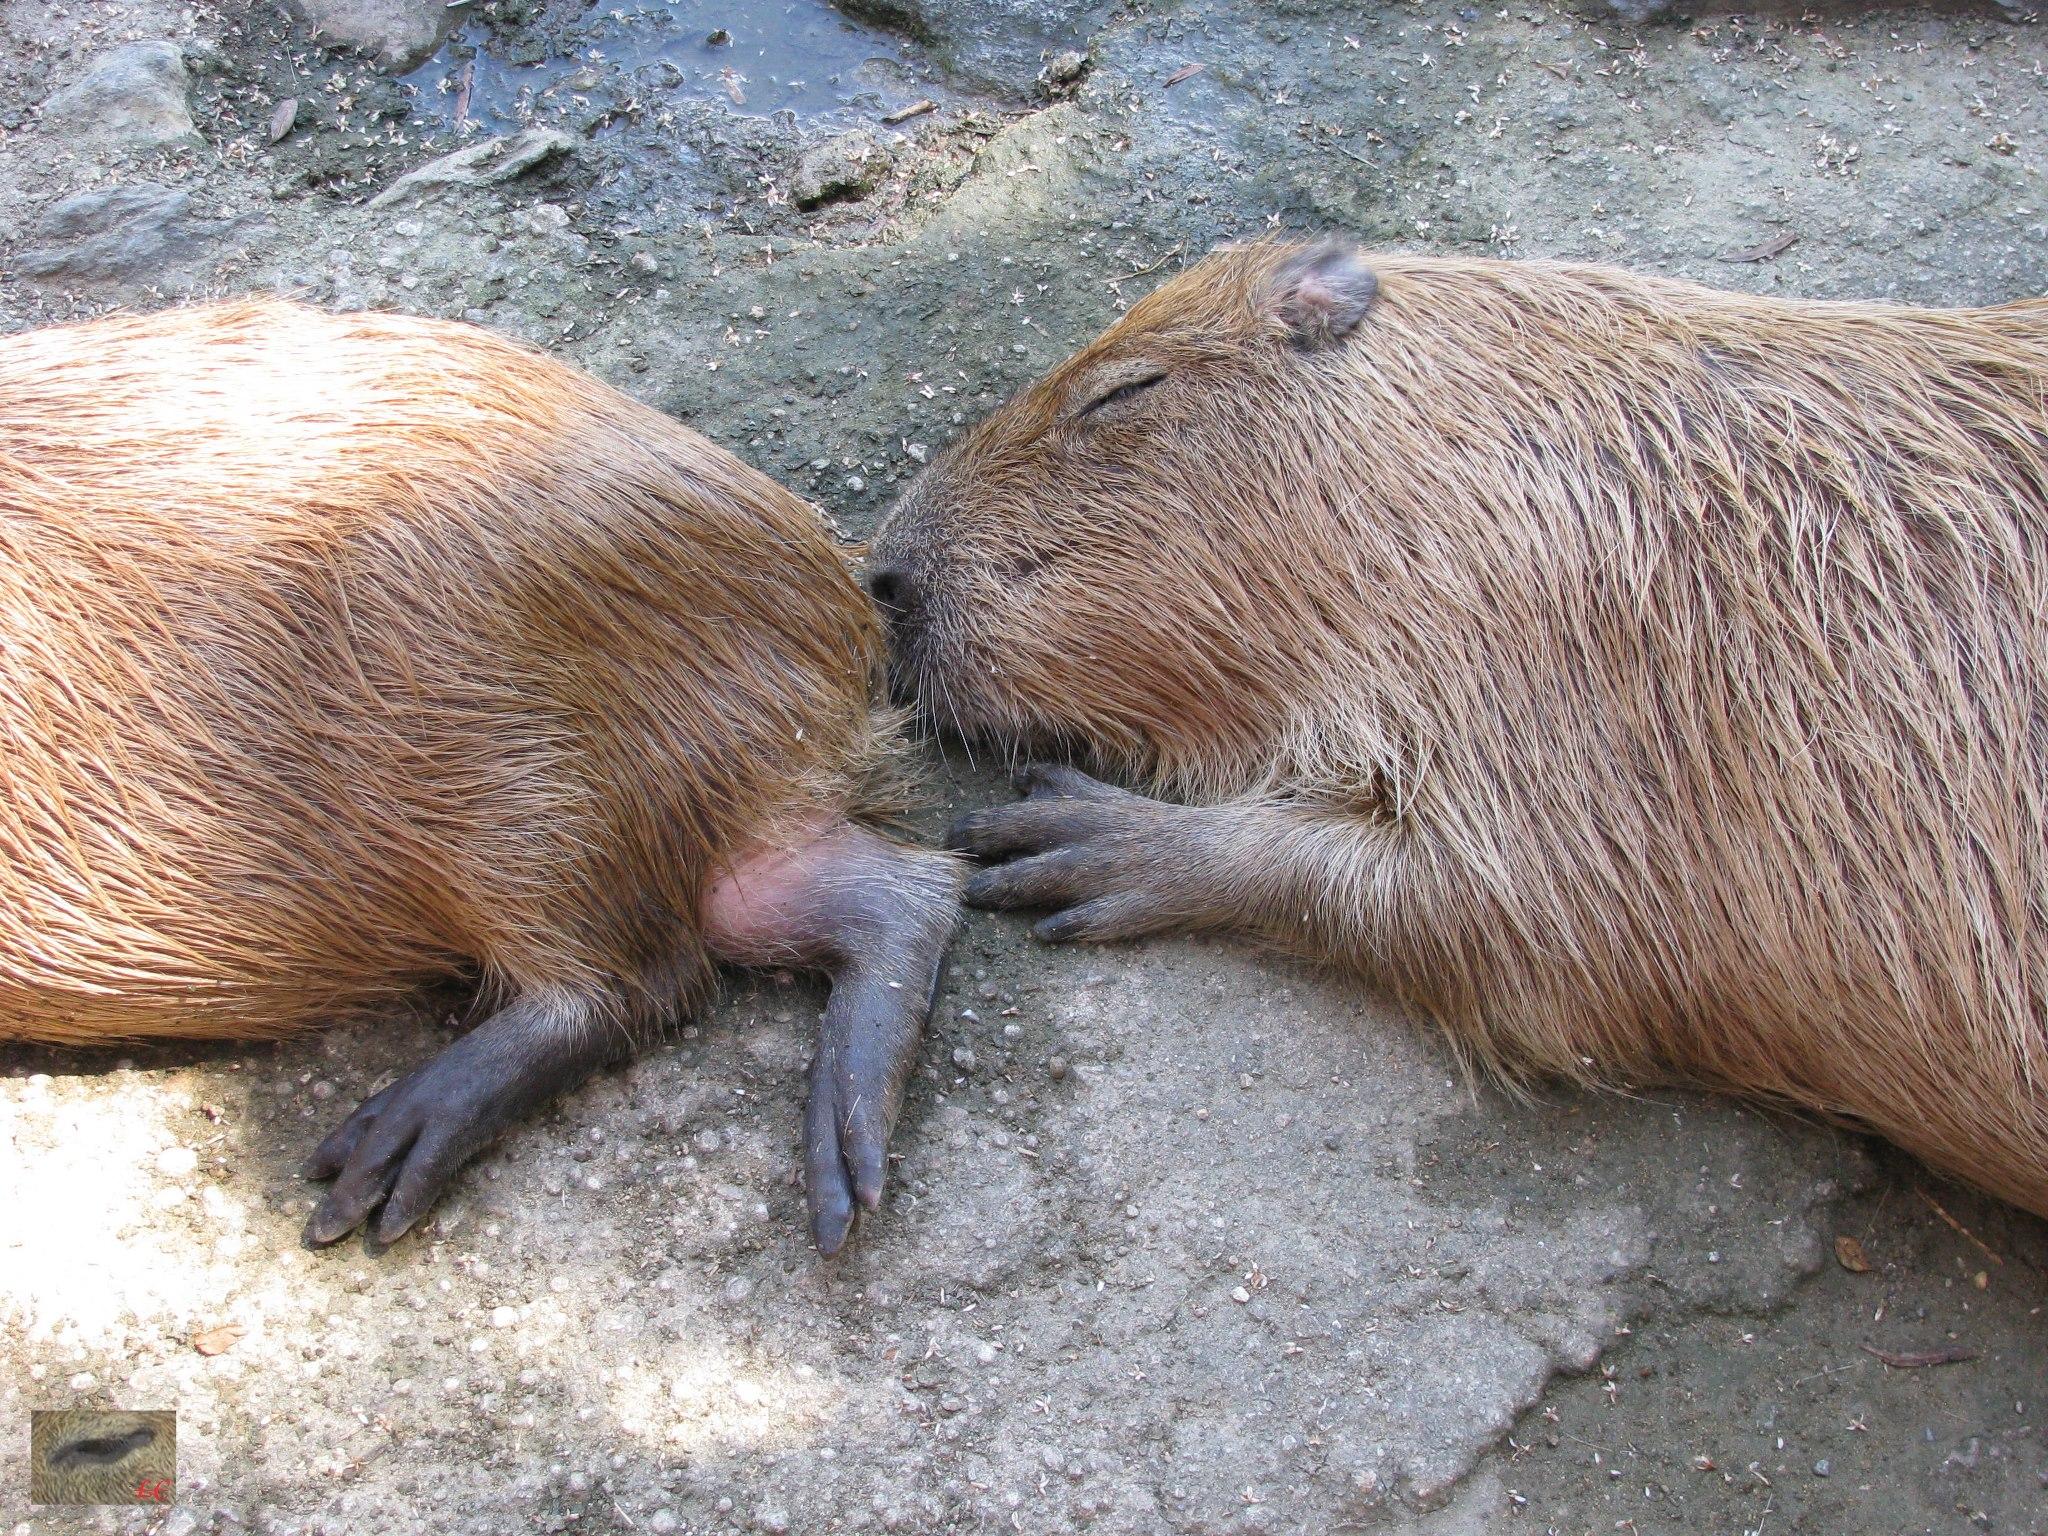 Yuzu and Zabon usually stayed close together. Very often sleeping nose to tail with one capybara nose in the other capybaras bottom ゆずとZabonは通常、近くに一緒に泊まりました。非常に多くの場合テールに鼻を眠っています。他のカピバラの底に1カピバラの鼻